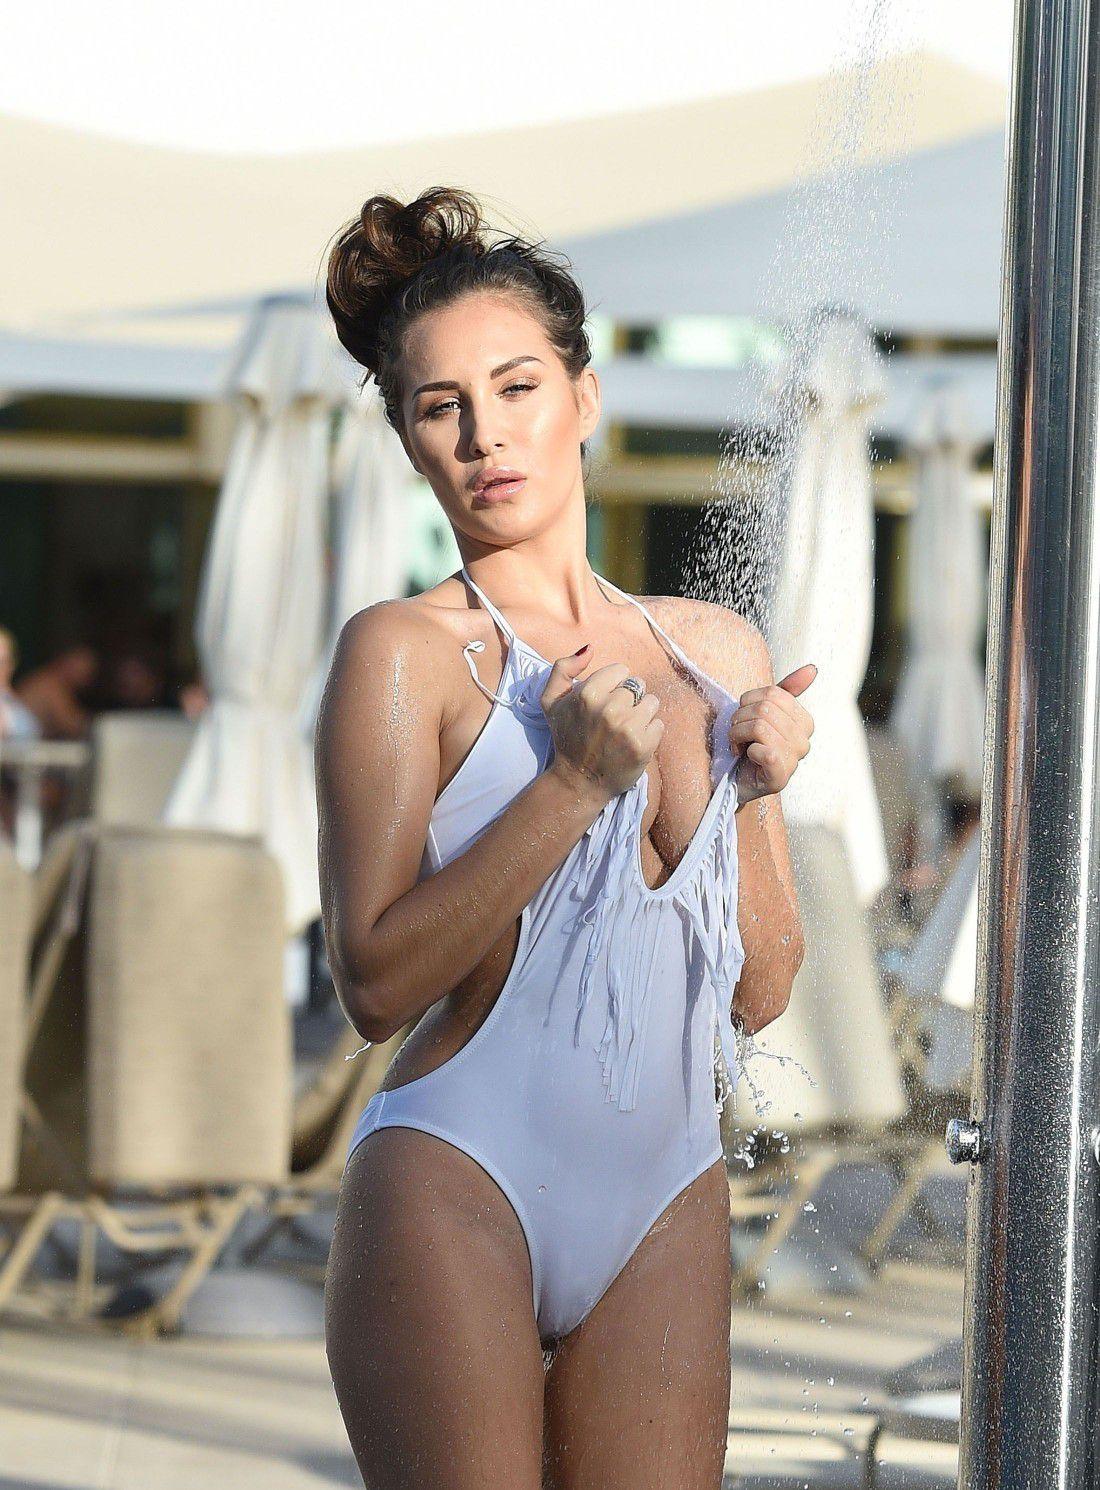 chloe-goodman-white-swimsuit-cameltoe-in-dubai-7616